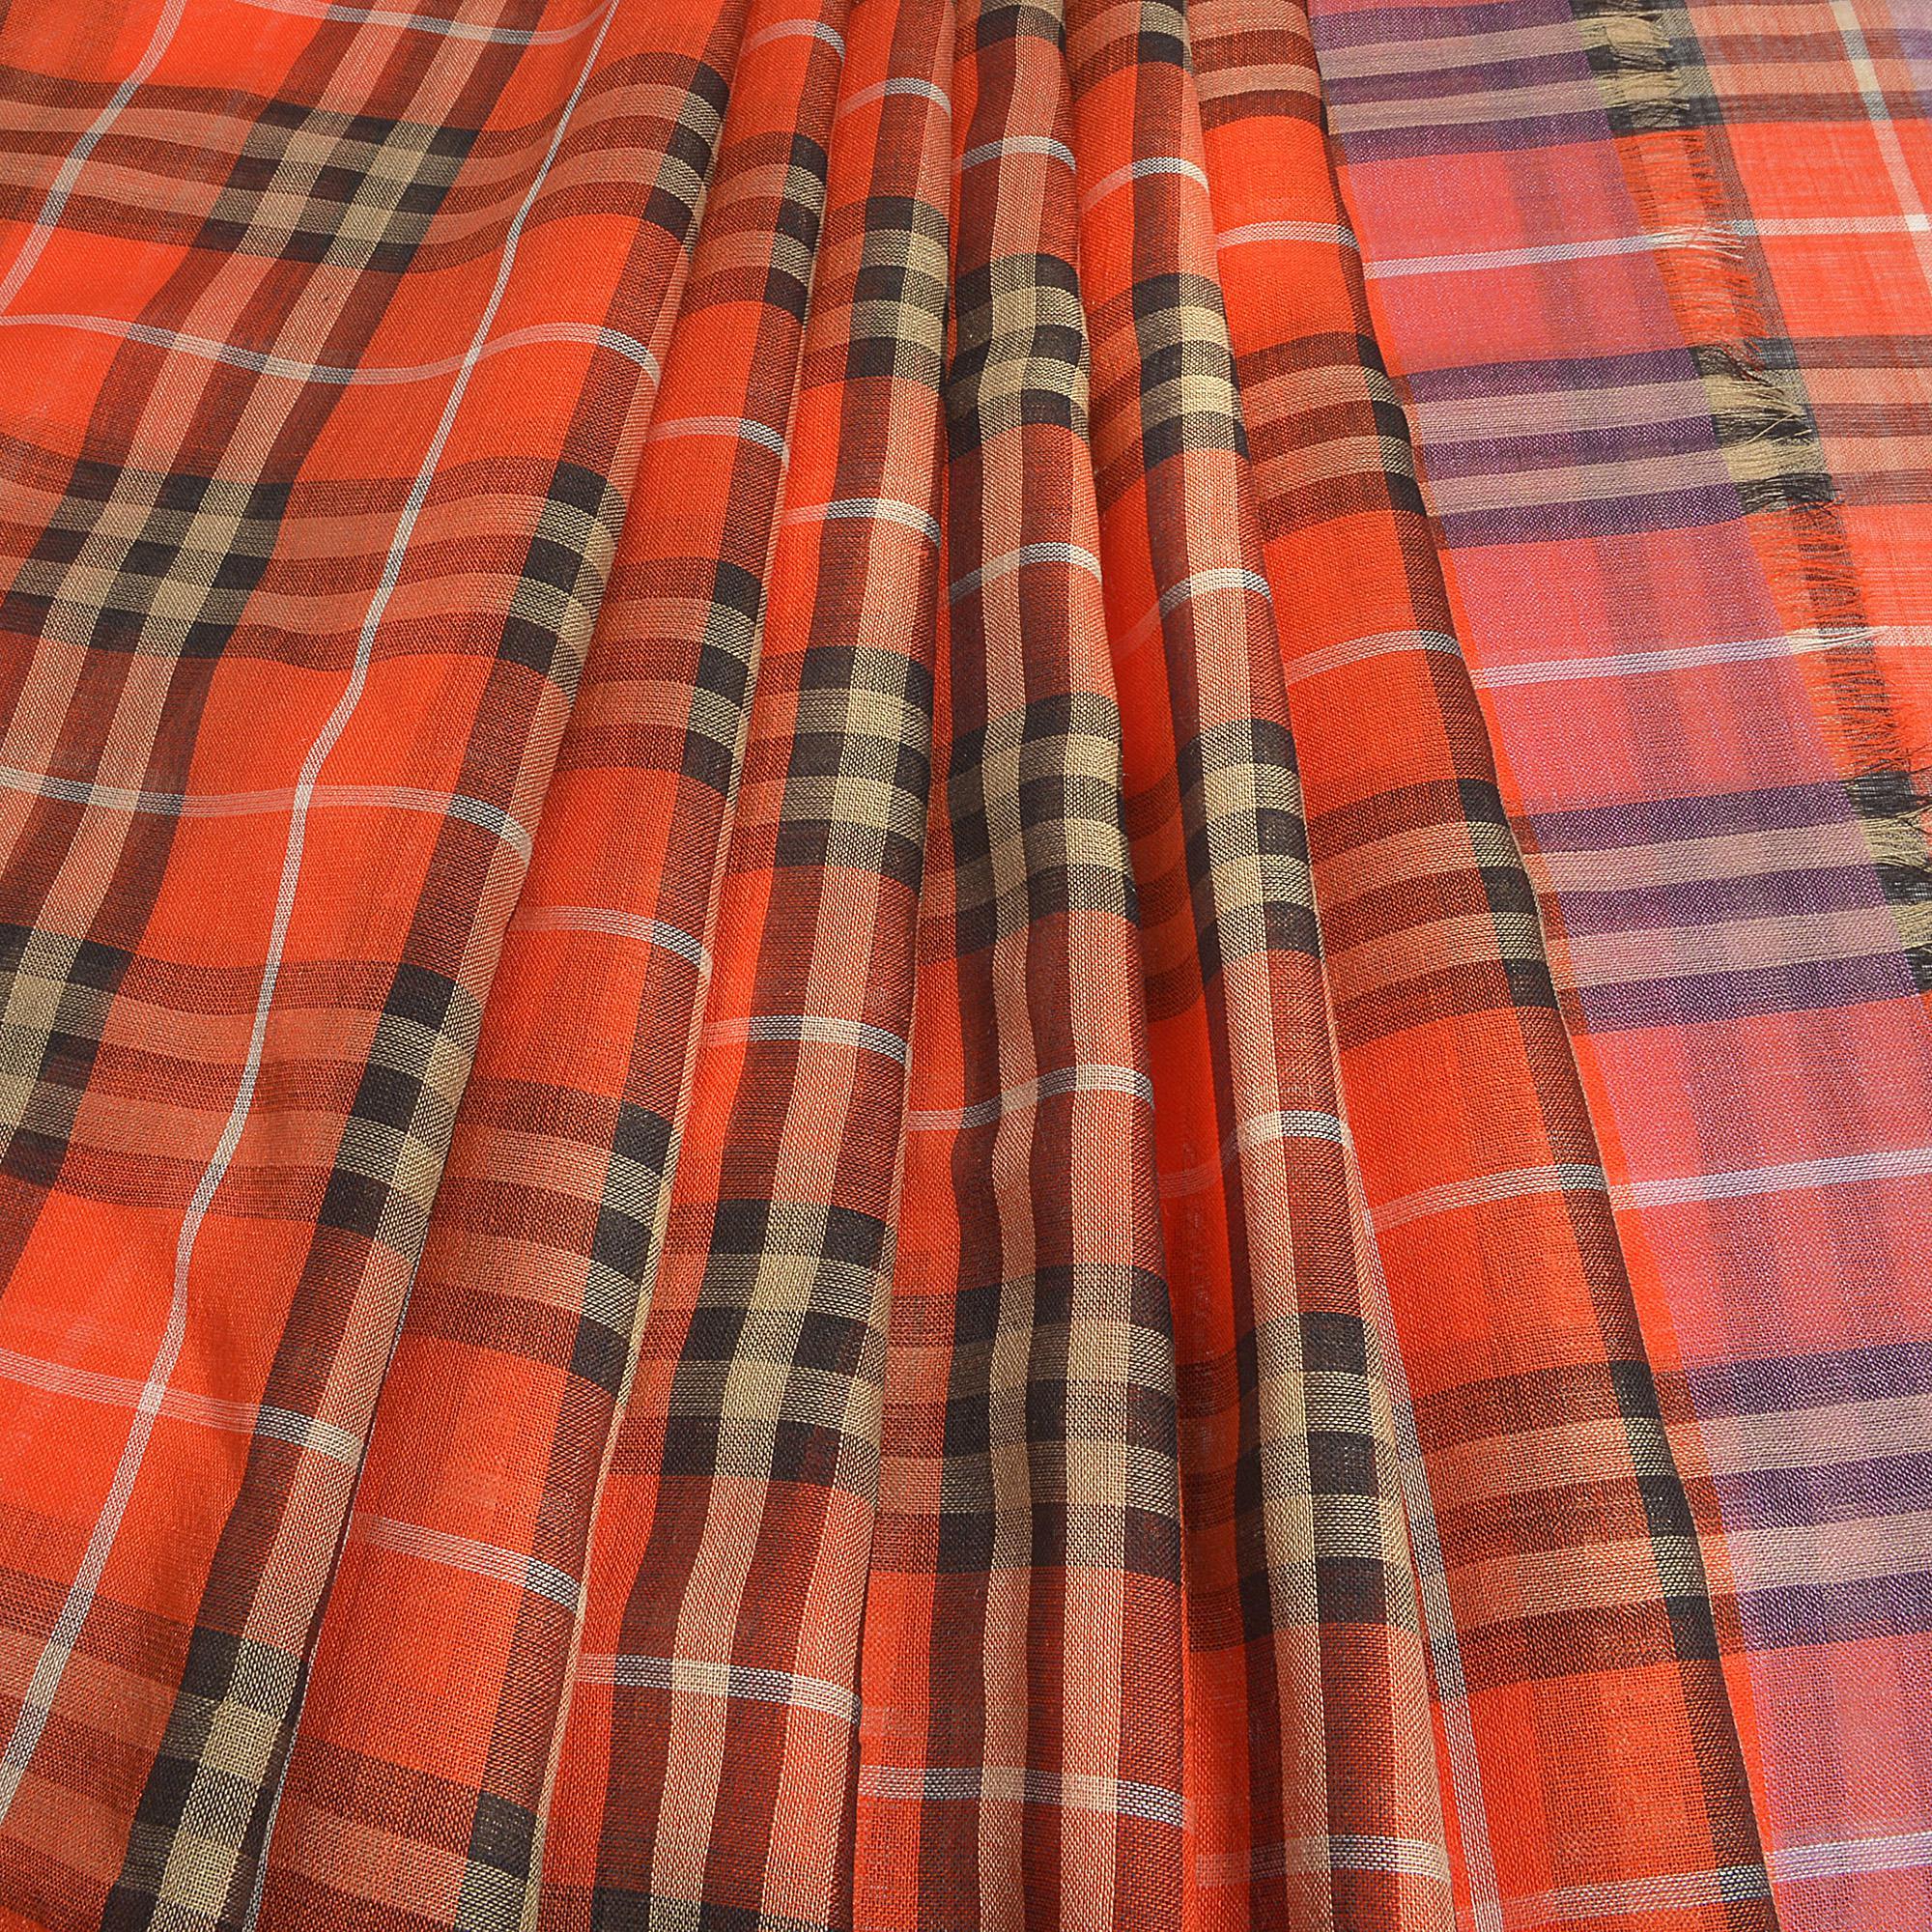 220X70 Vintage Check Gauze Scarf in Bright Orange Wool Burberry S4HvYczF